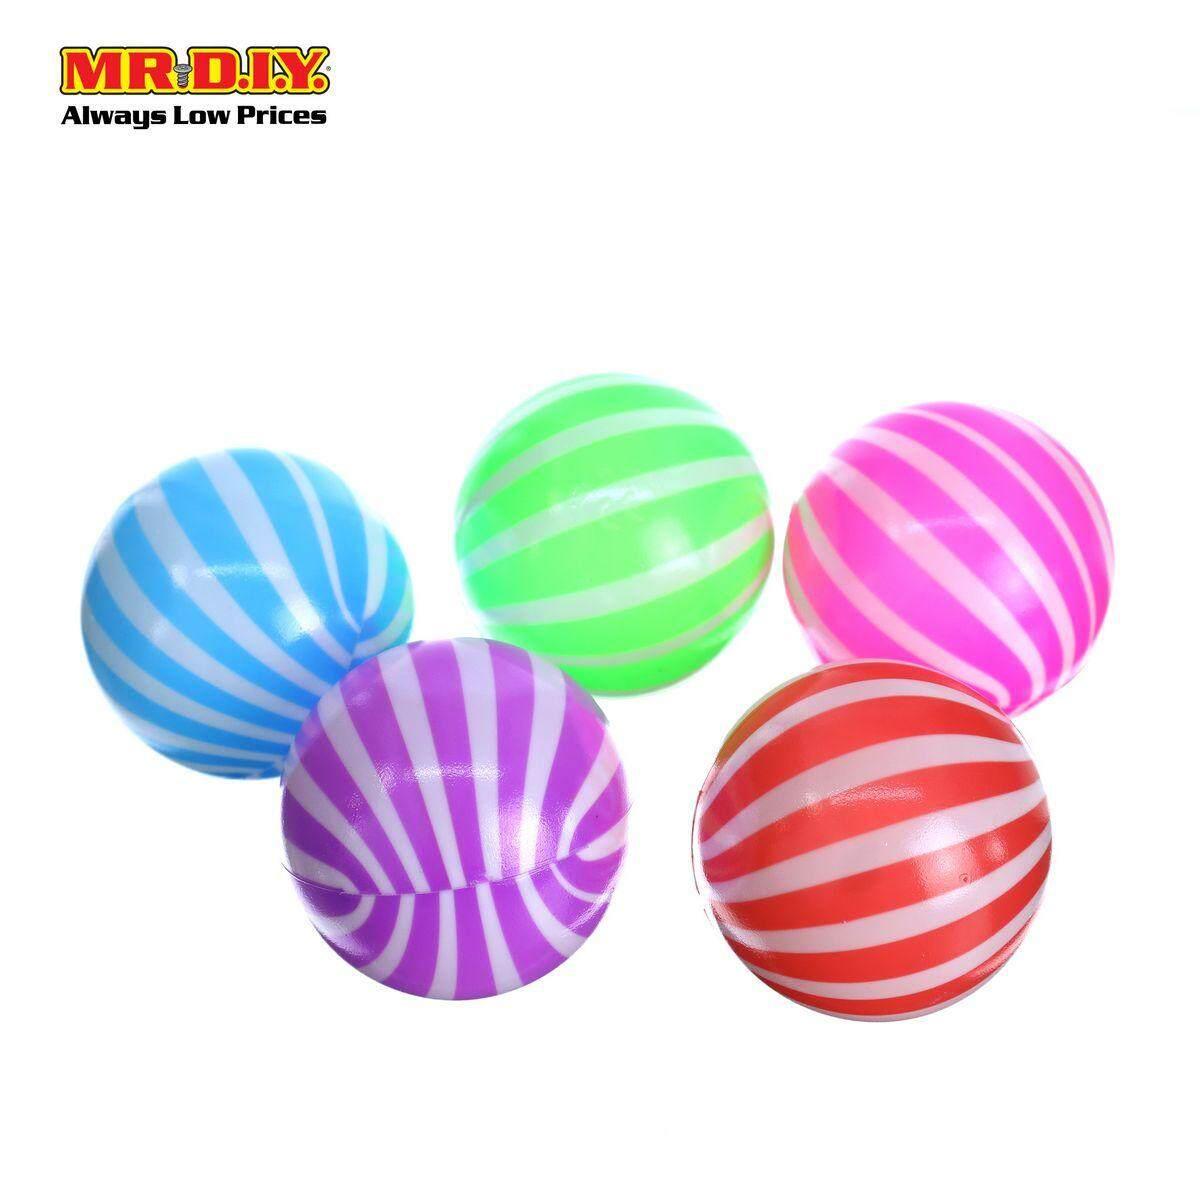 Plastic Ball 7cm ( 5 Pcs ) By Mr Diy.